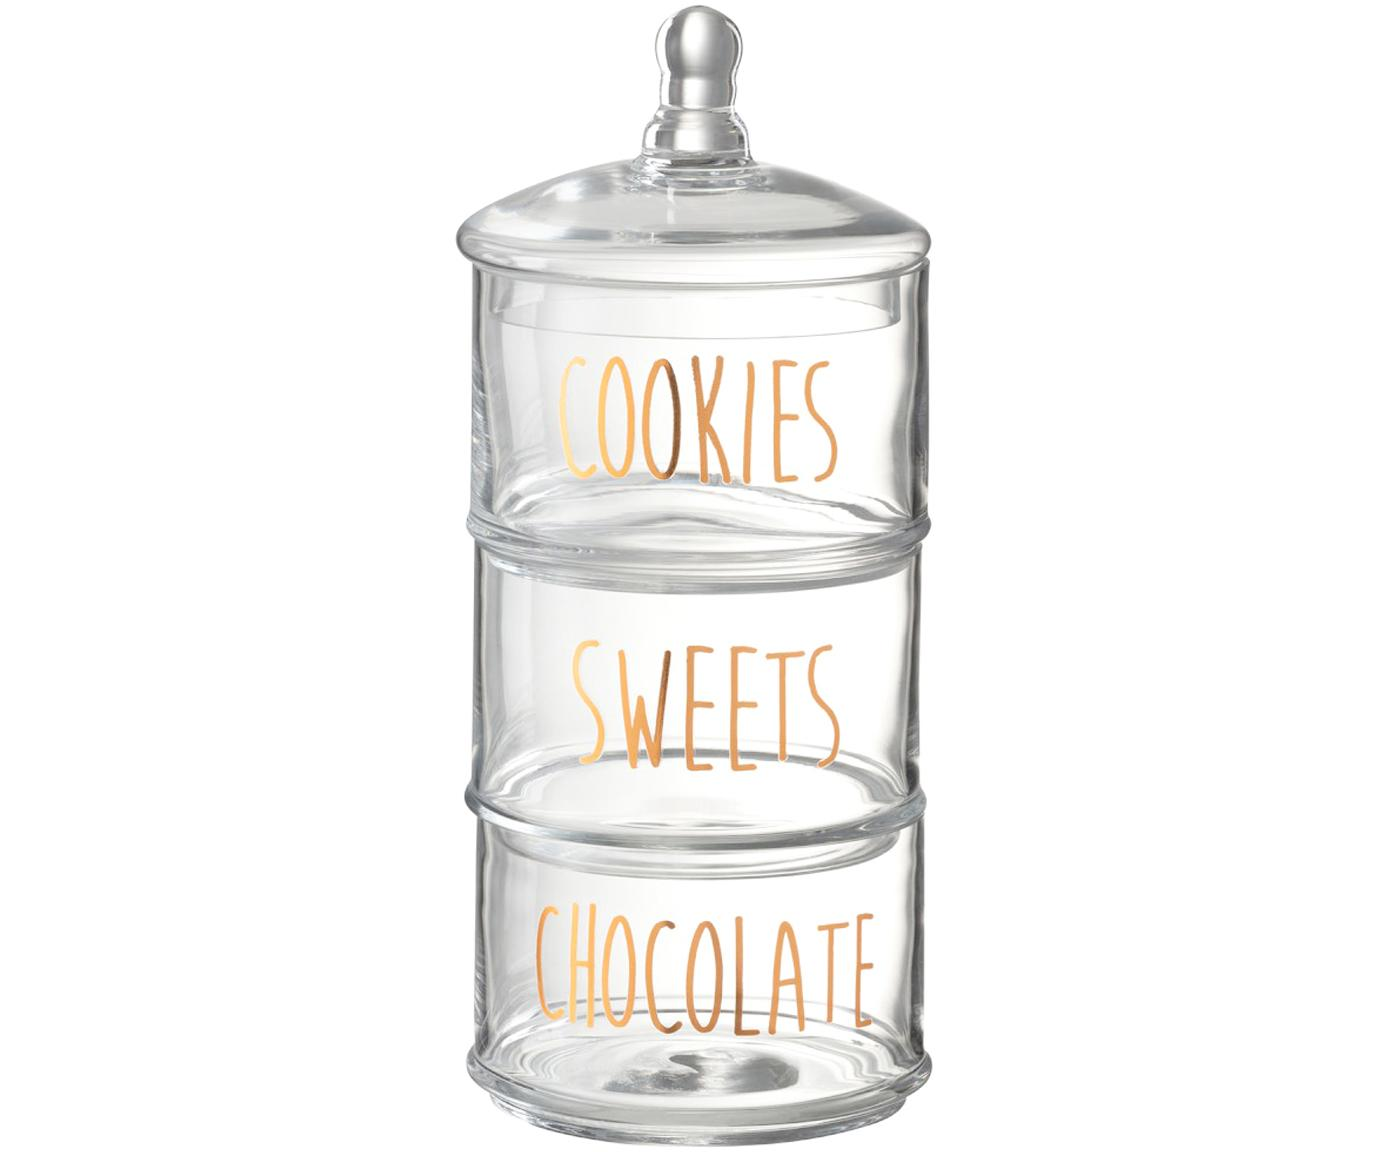 Opbergpottenset  Sweets, 4-delig, Glas, Transparant, koperkleurig, Ø 18 x H 40 cm